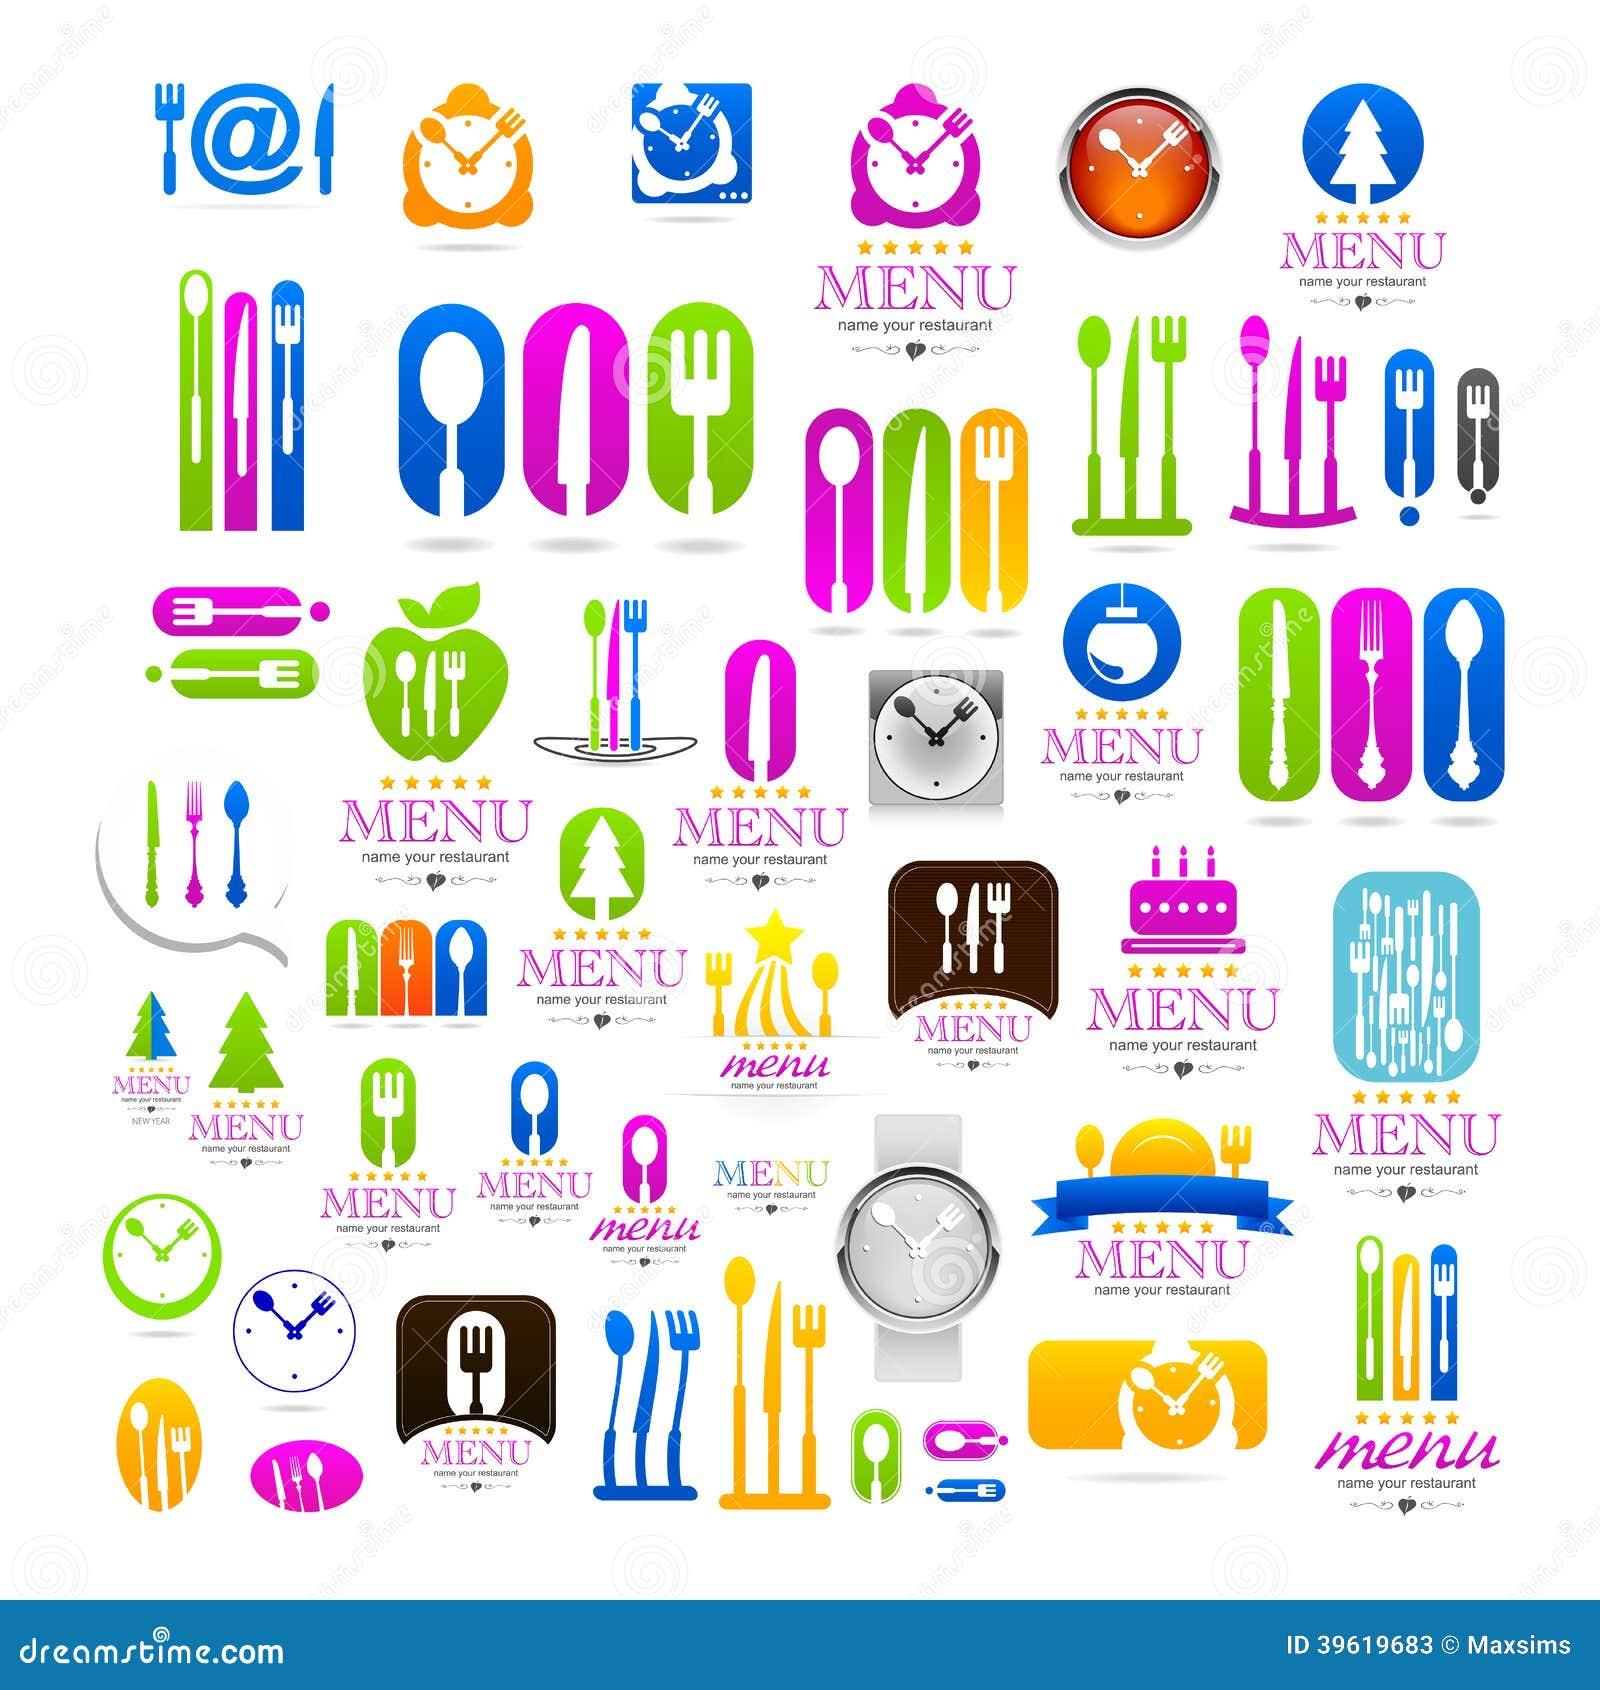 kitchen set business logo web icons sign stock vector image business icons kitchen logo